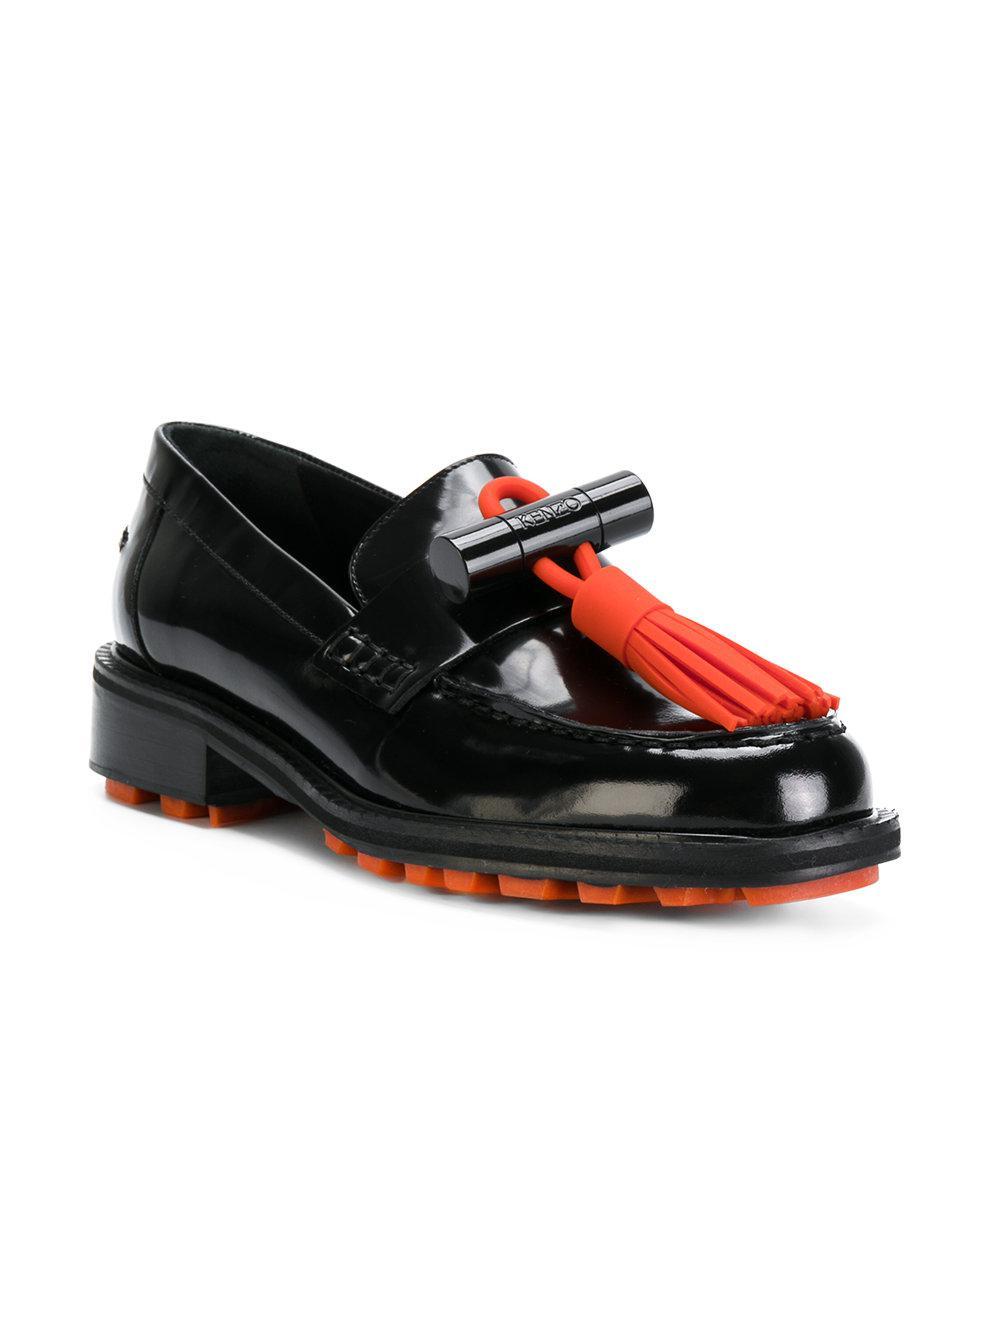 13eb66f318a Lyst - KENZO Georgia Loafers in Black